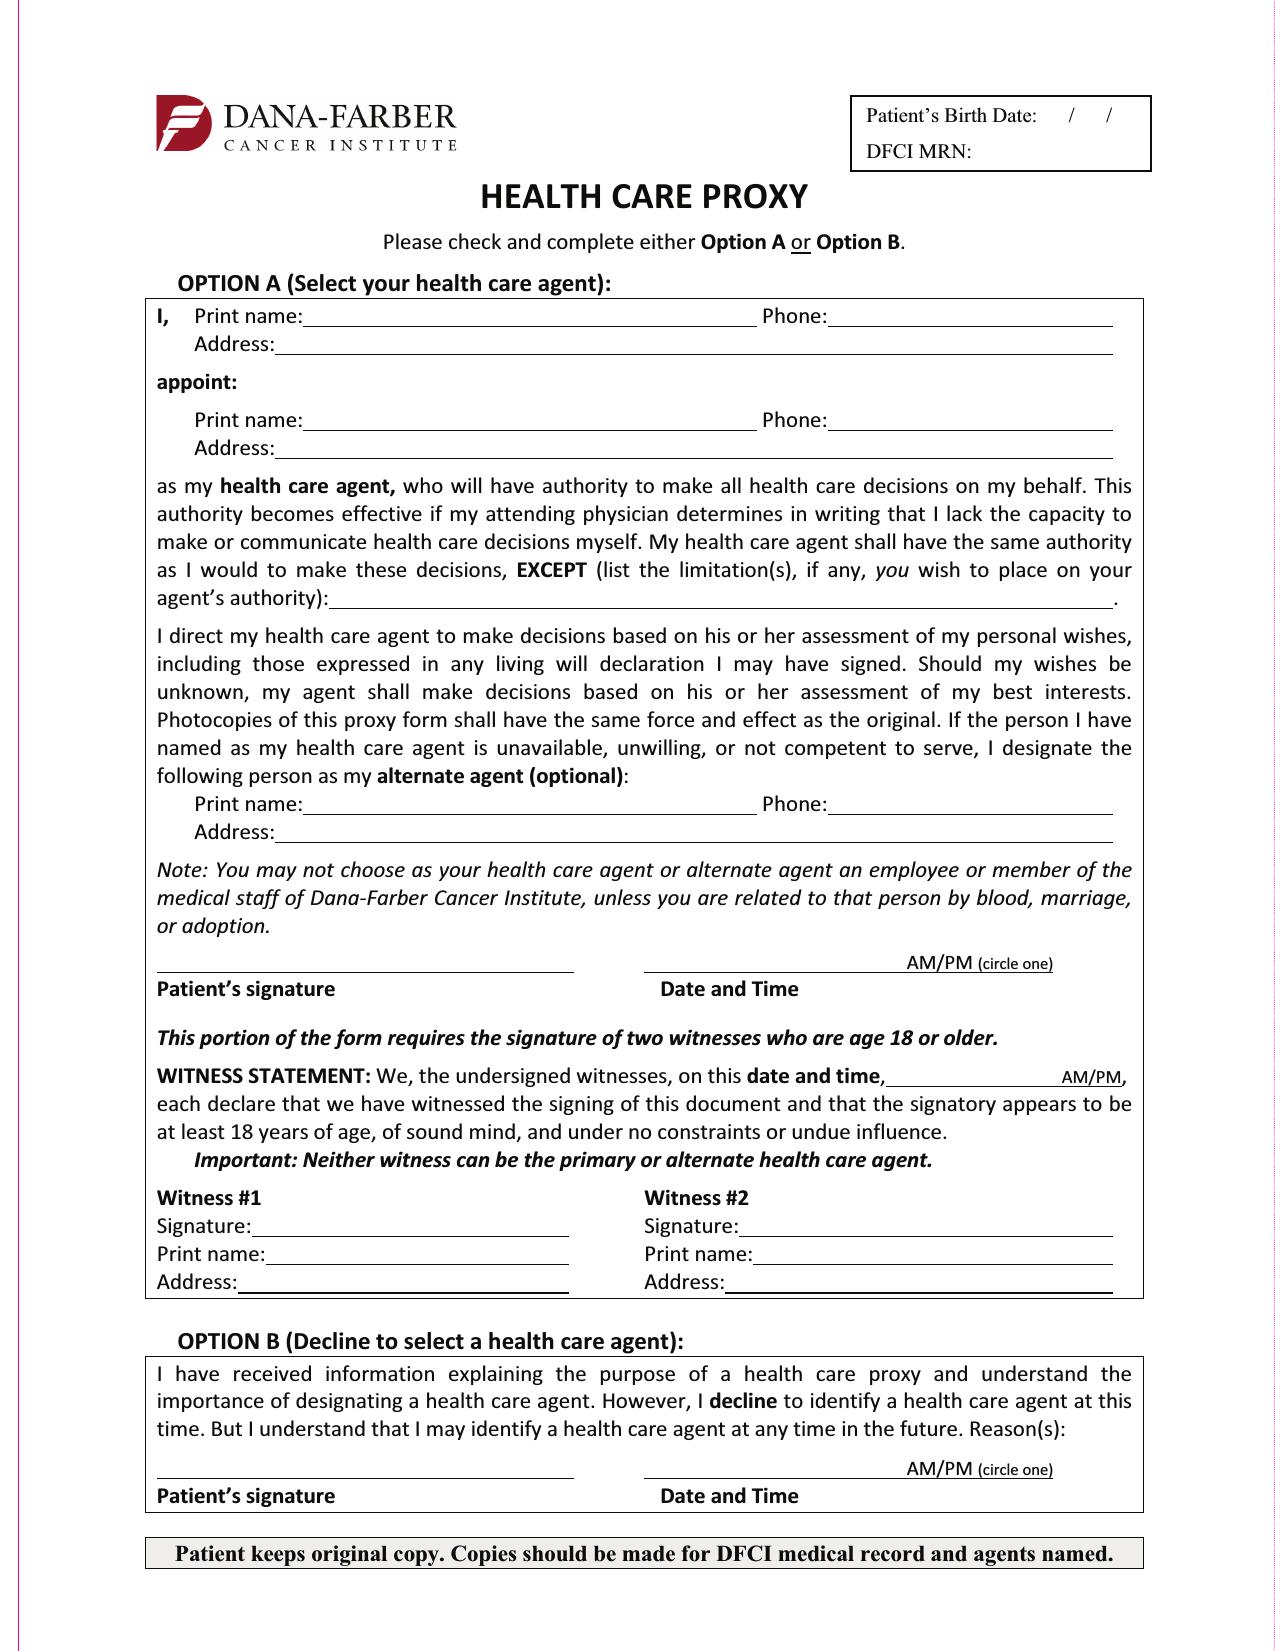 download massachusetts living will form  u2013 advance